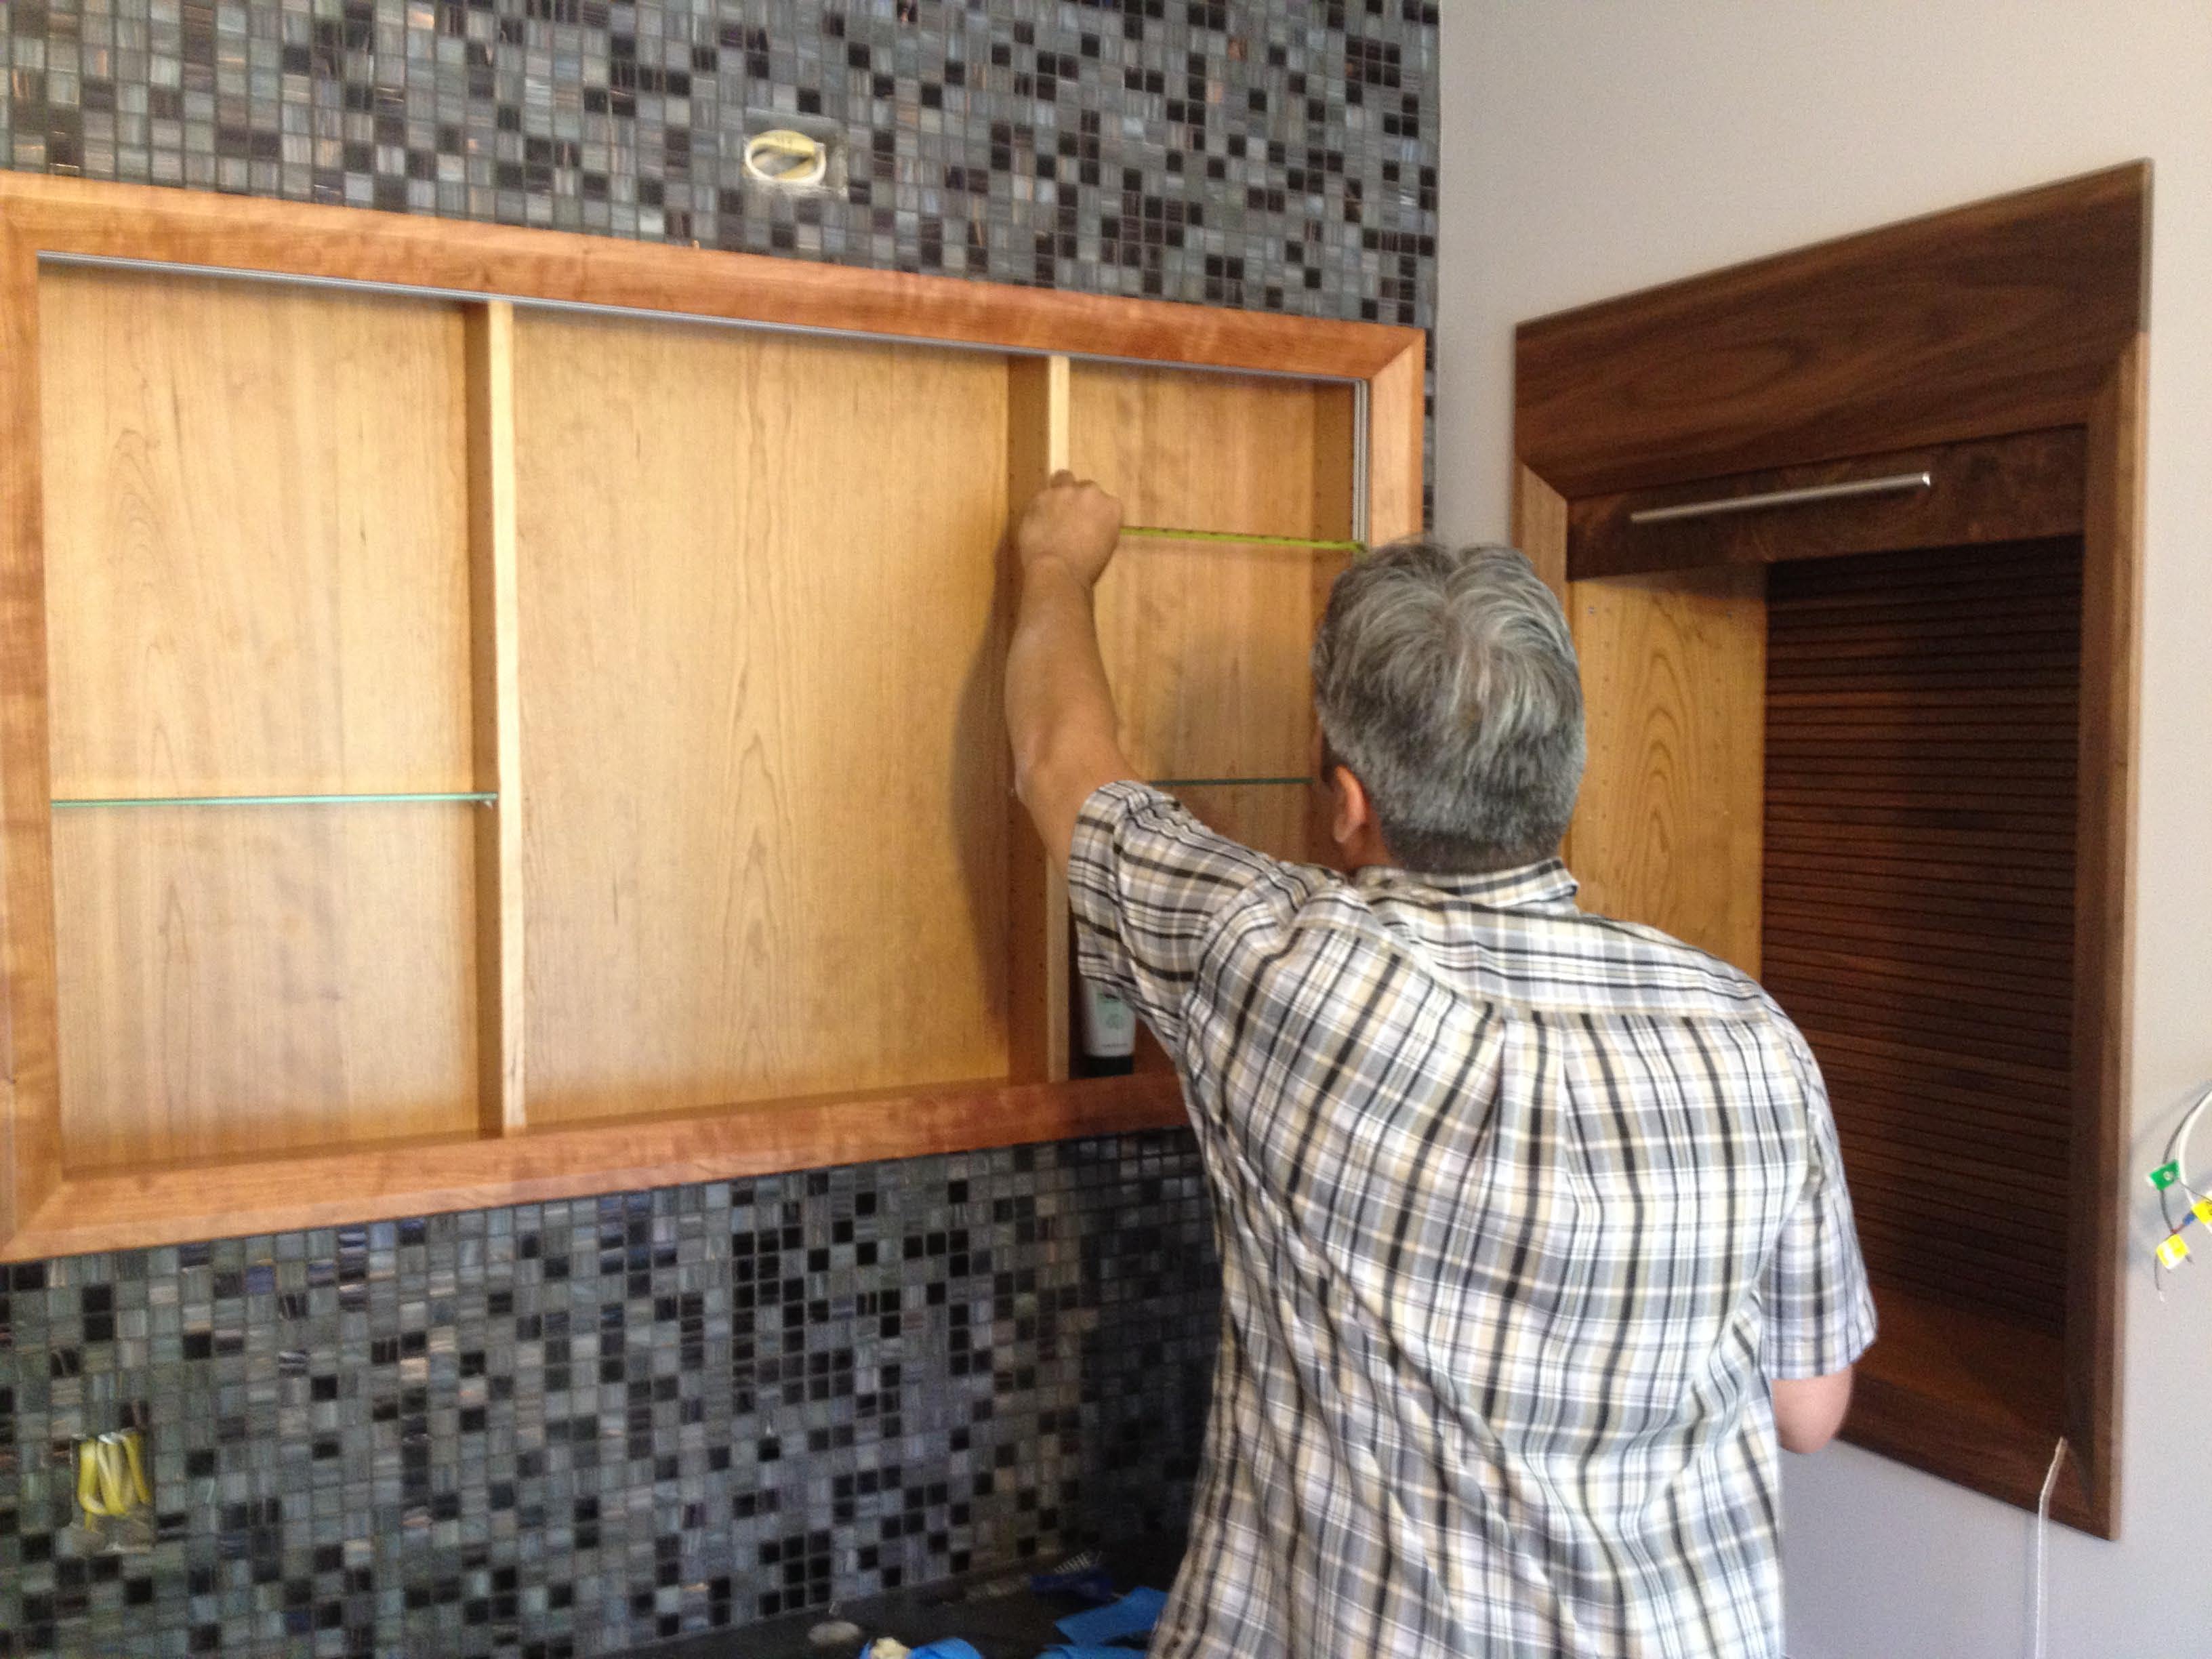 cherry medicine cabinet wglass shelves and sliding mirror doors 3